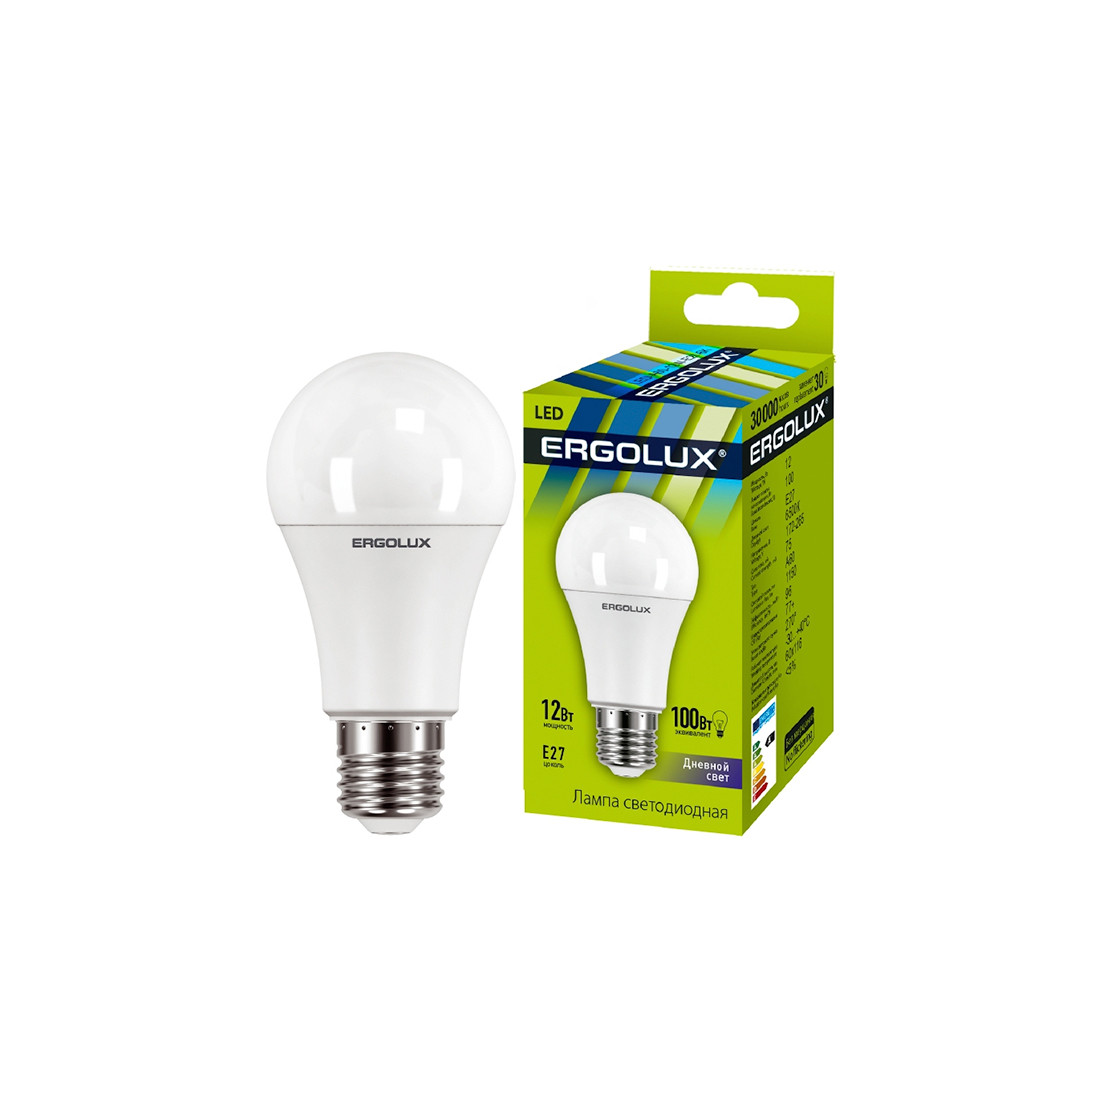 Эл. лампа светодиодная Ergolux LED-A60-12W-E27-6K ЛОН Дневной